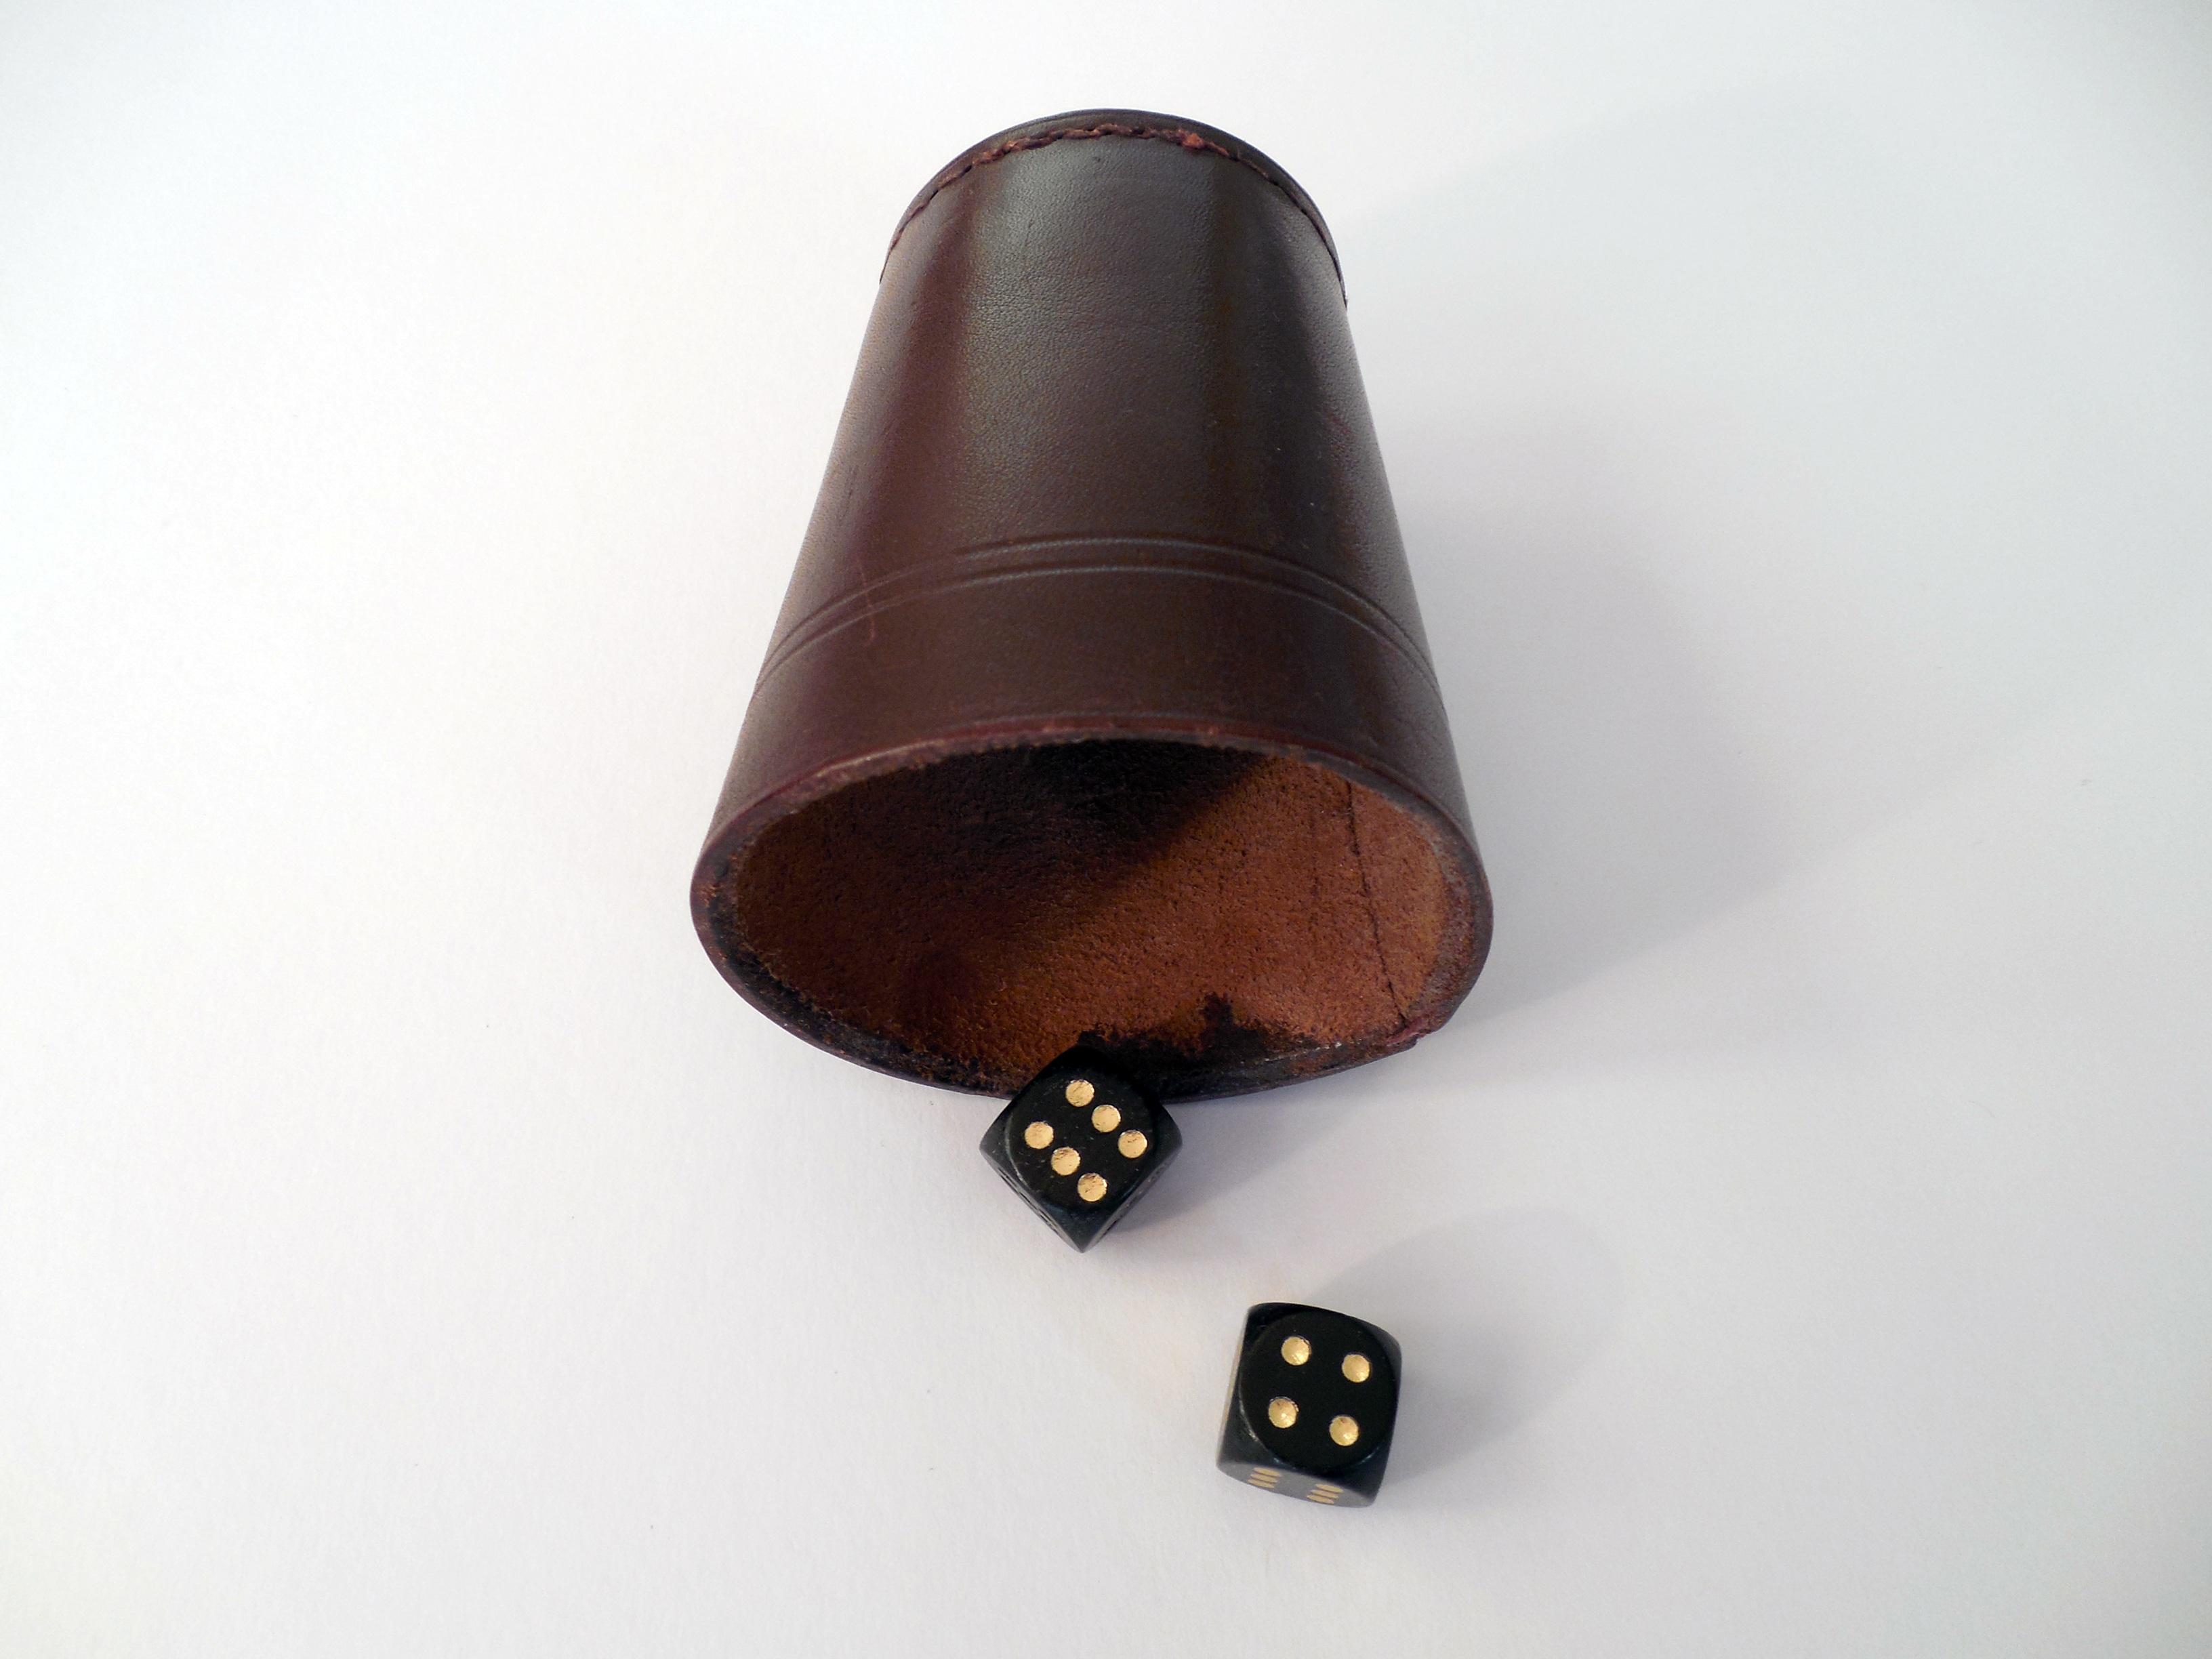 Free Images : play, square, four, random, casino, gambling